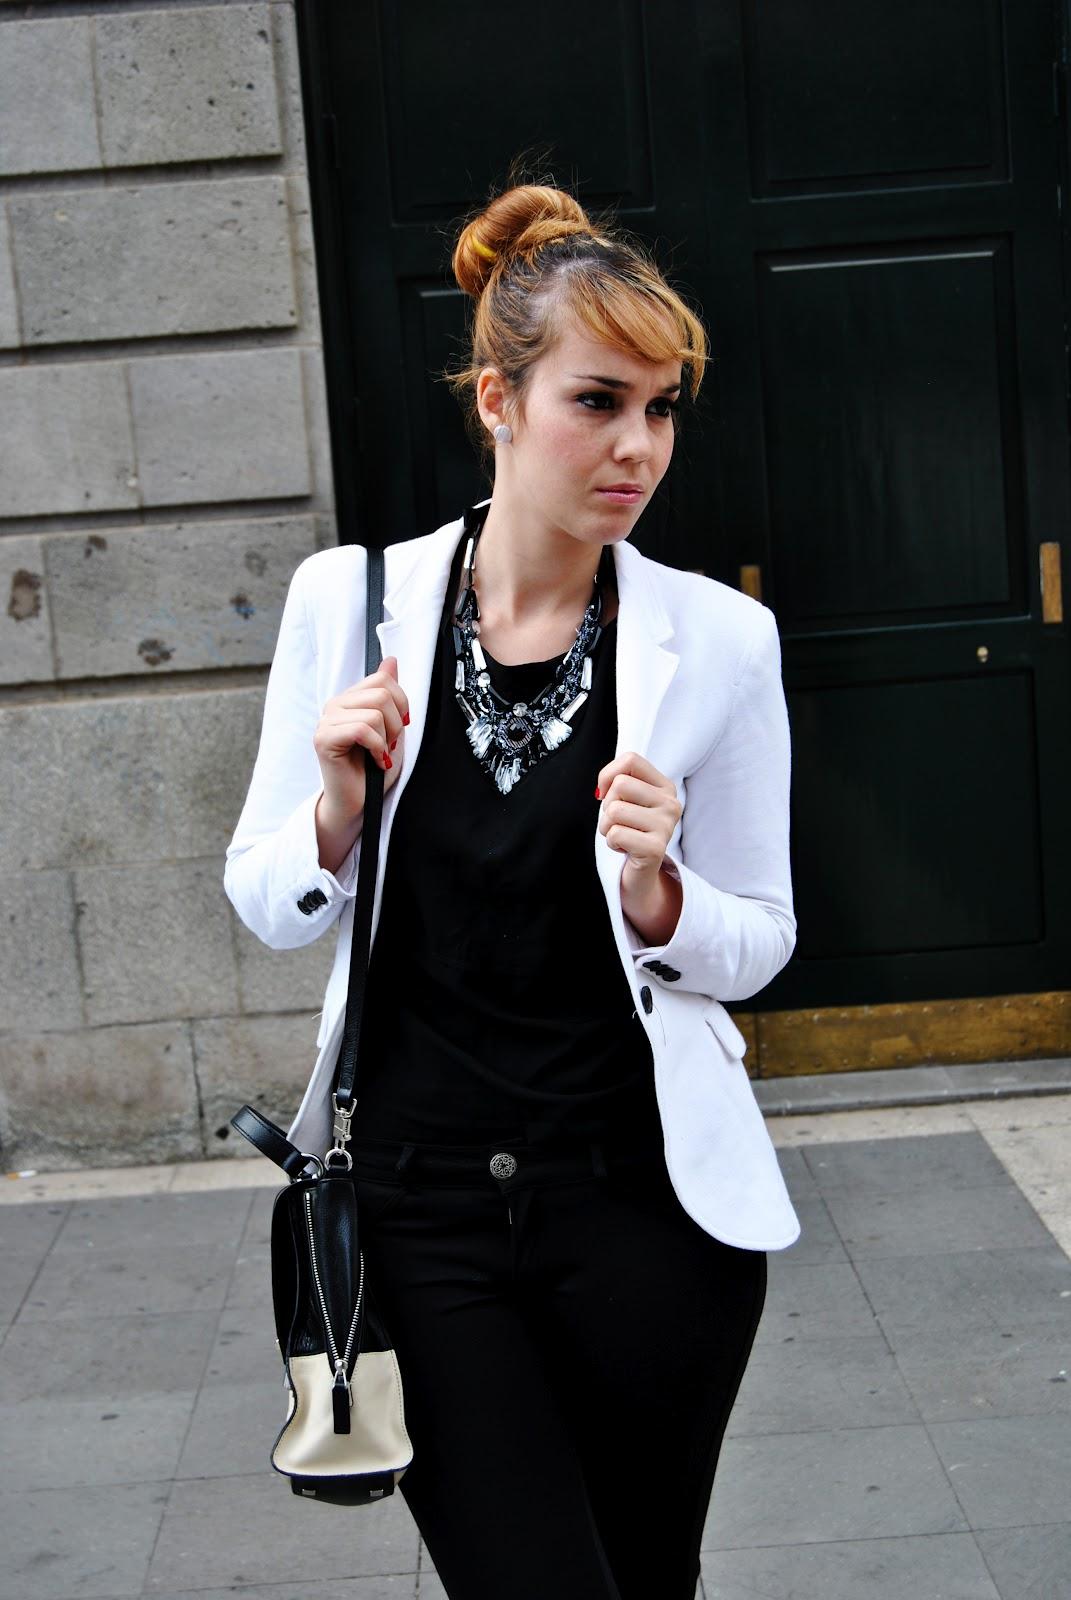 nery hdez, iphone case, leggins, white blazer